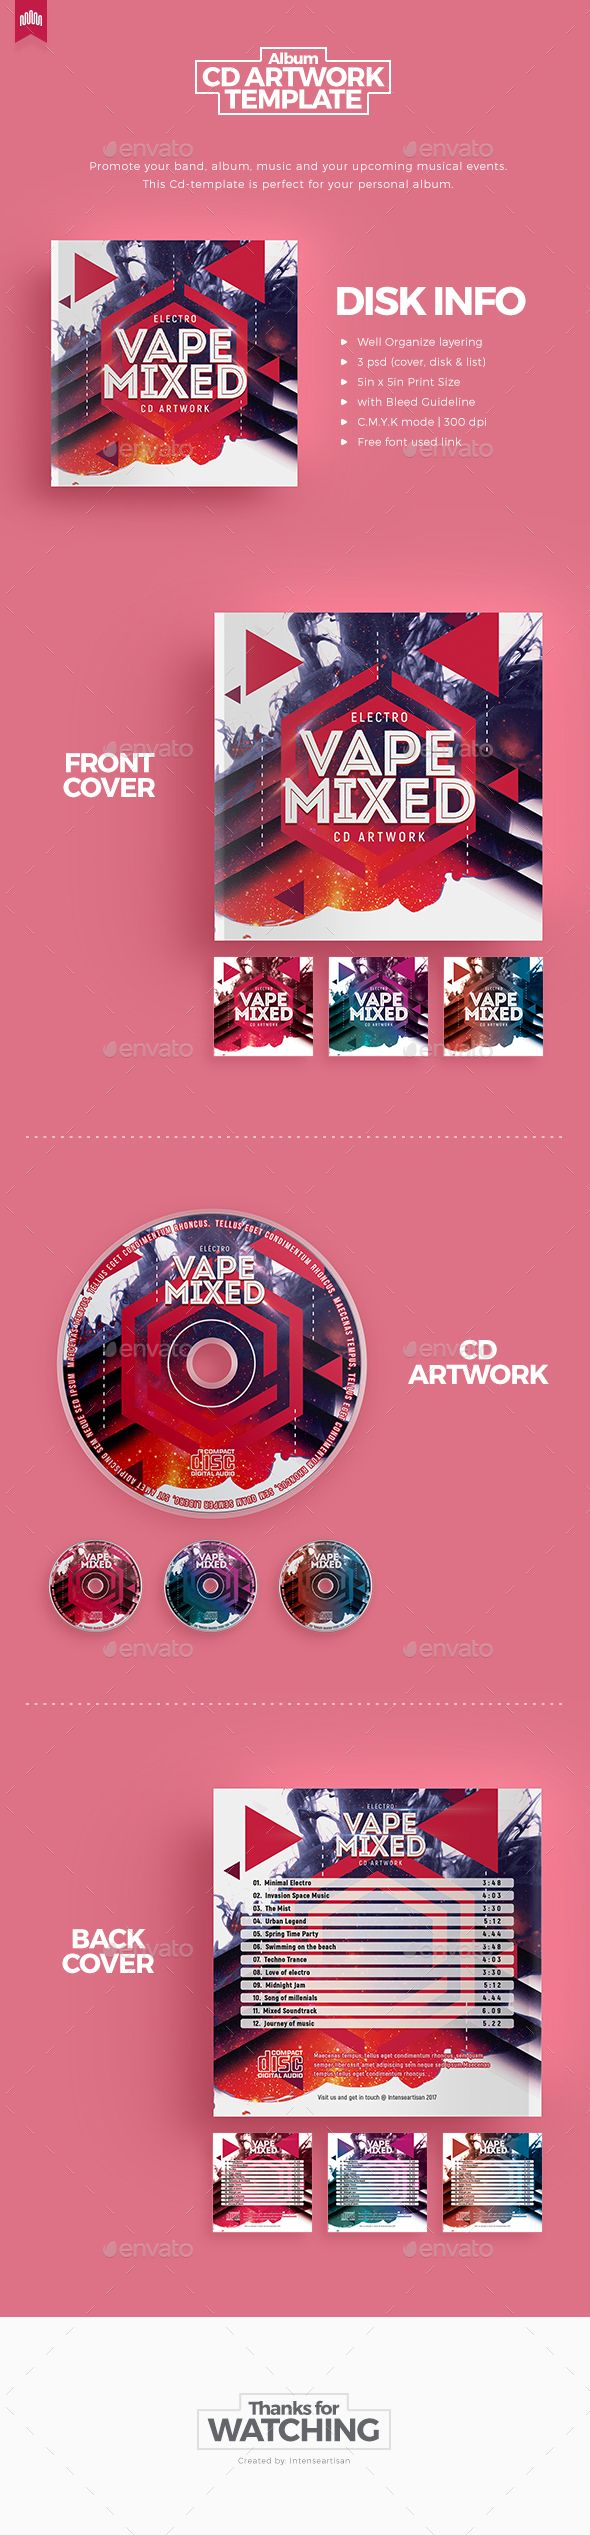 Vape Mixed - Cd Artwork - #CD & #DVD Artwork Print Templates Download here:  https://graphicriver.net/item/vape-mixed-cd-artwork/20308812?ref=alena994